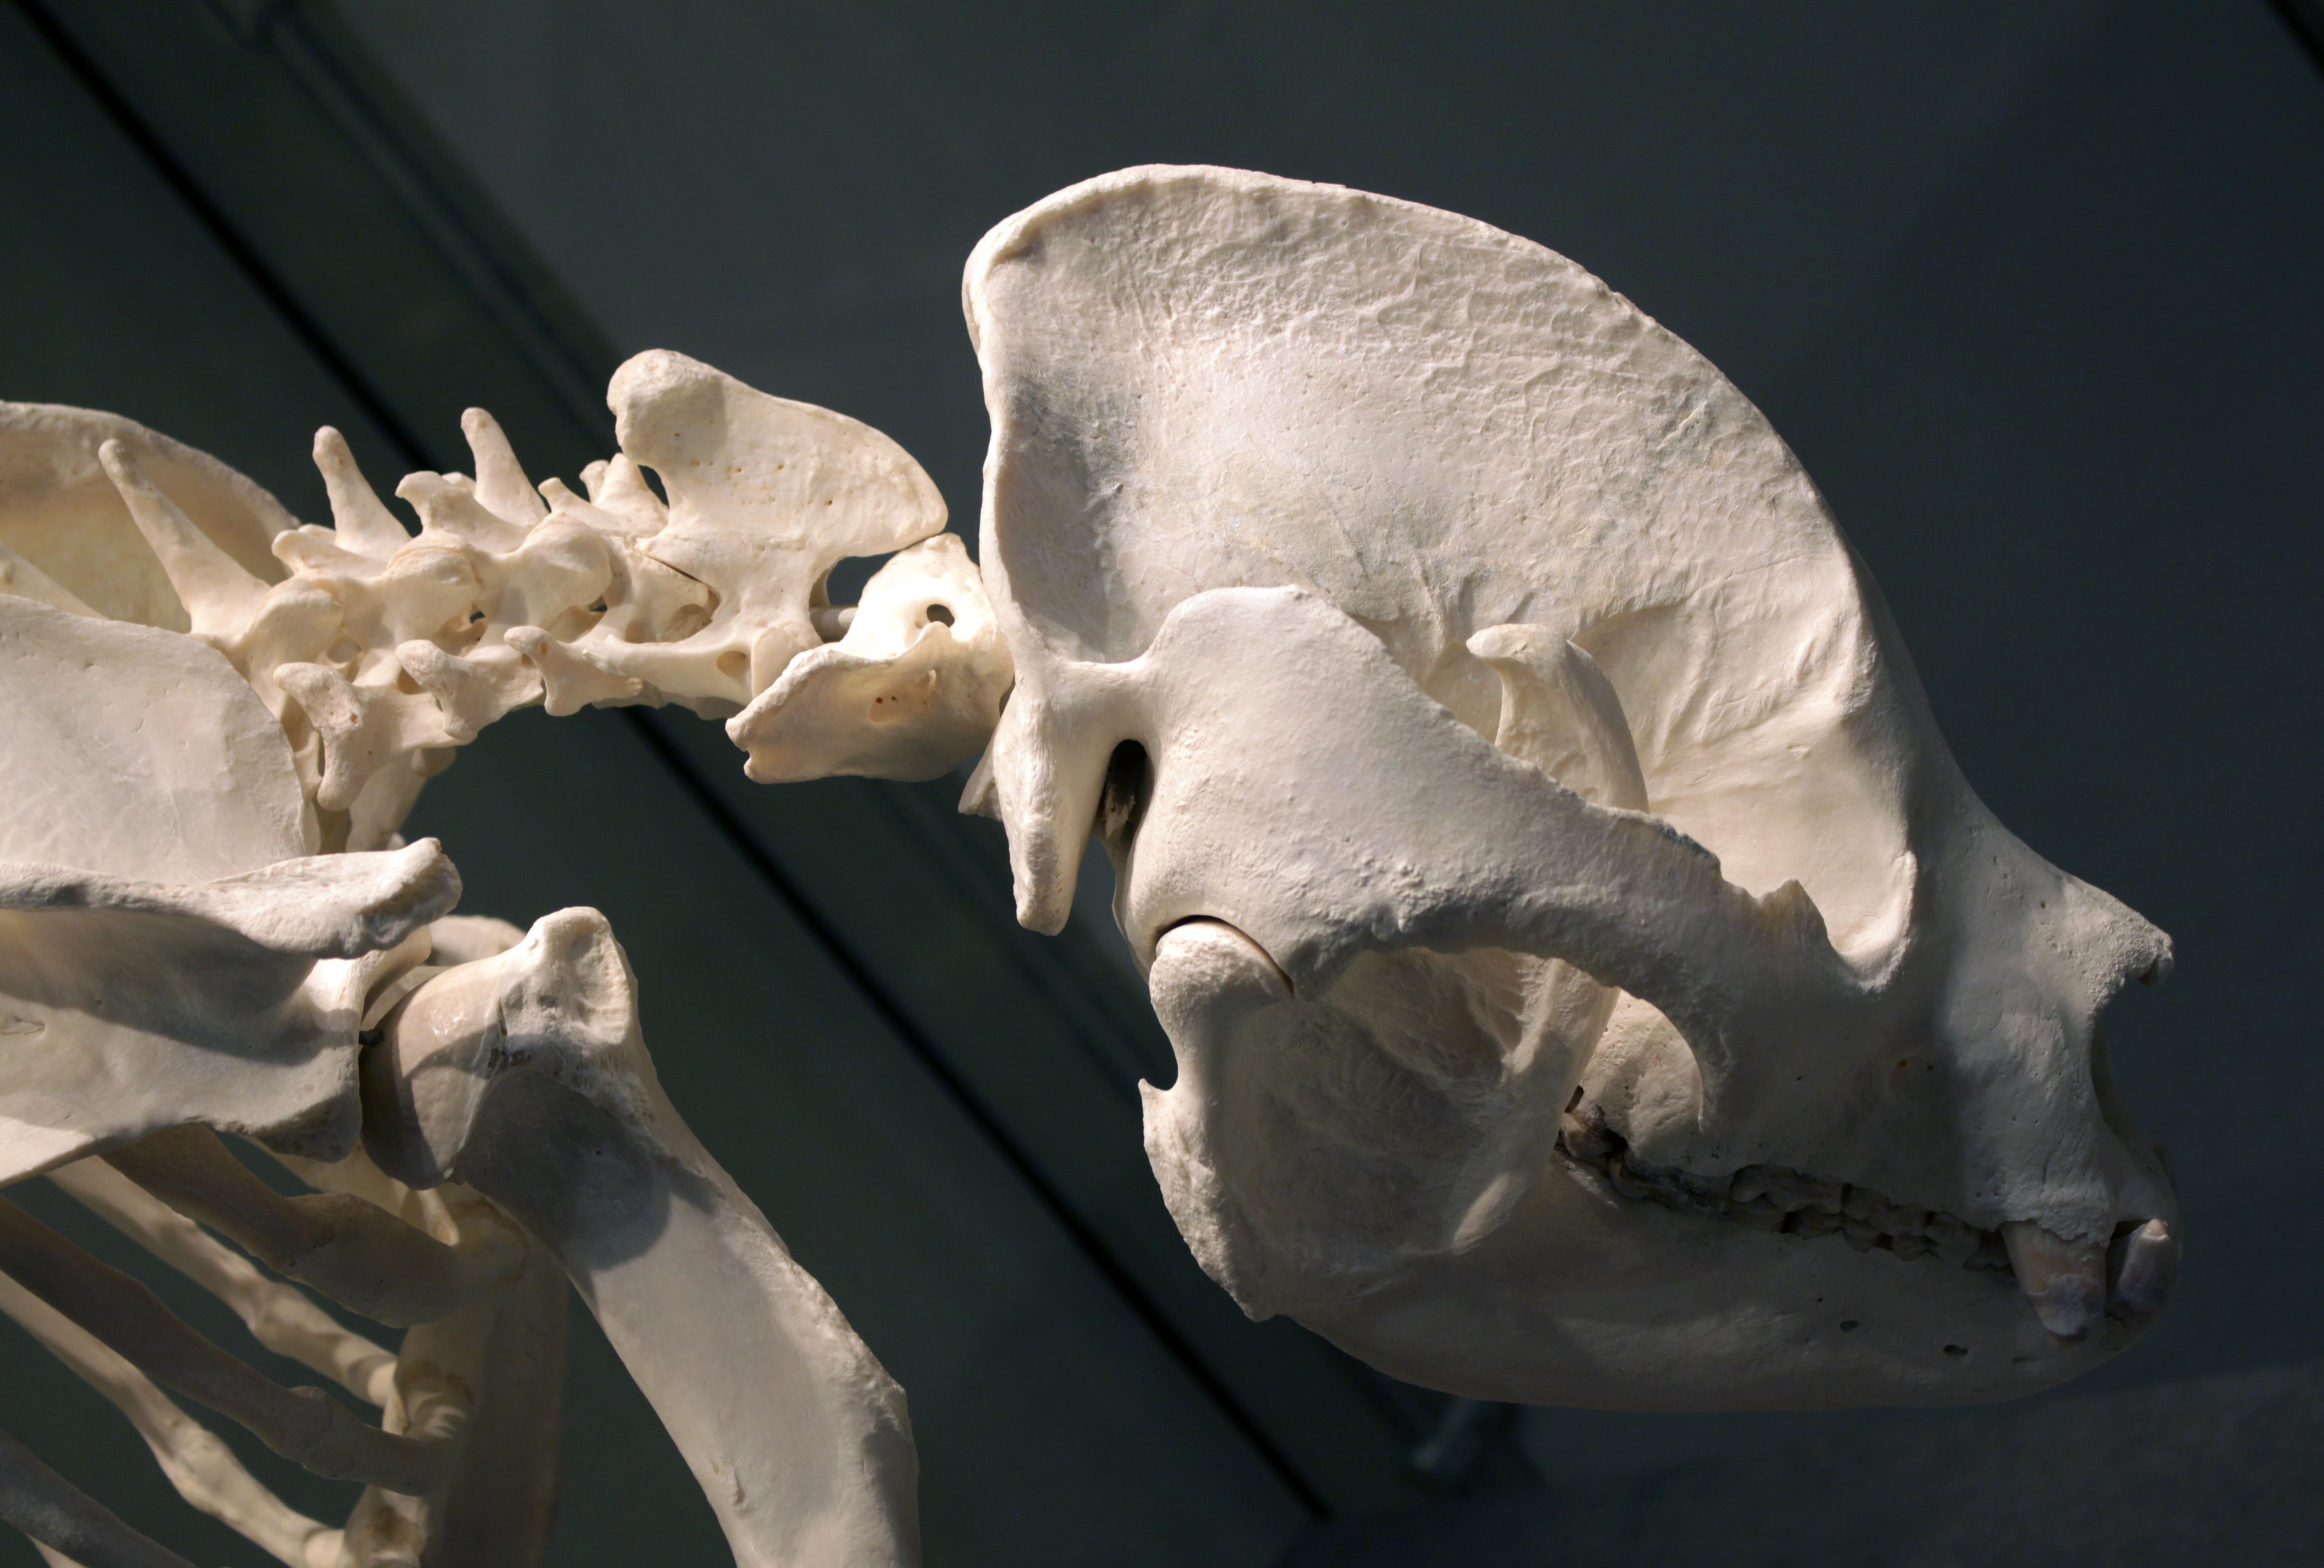 https://upload.wikimedia.org/wikipedia/commons/f/f4/Giant_panda_skull_Bao_Bao_Berlin_Museum_f%C3%BCr_Naturkunde_28042018.jpg